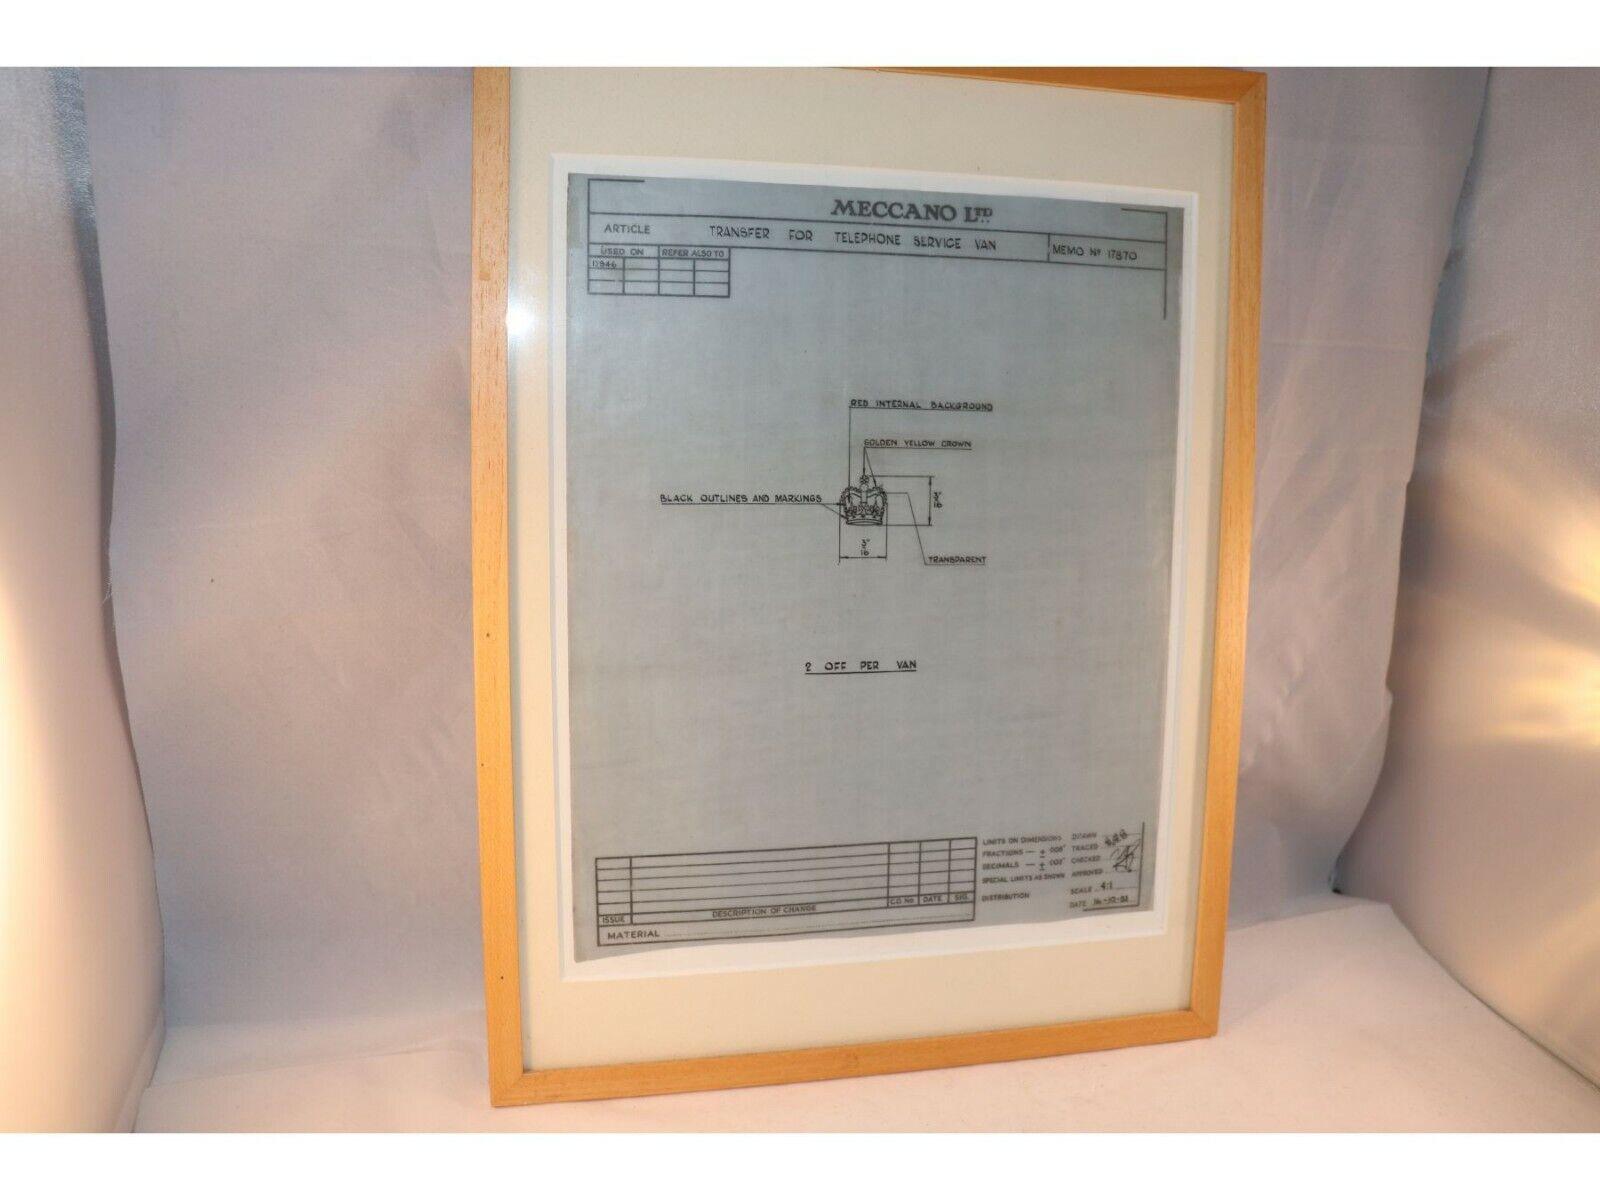 Meccano LTD Memo 17870 Drawing for Telephone Service Van in mint condition RARE